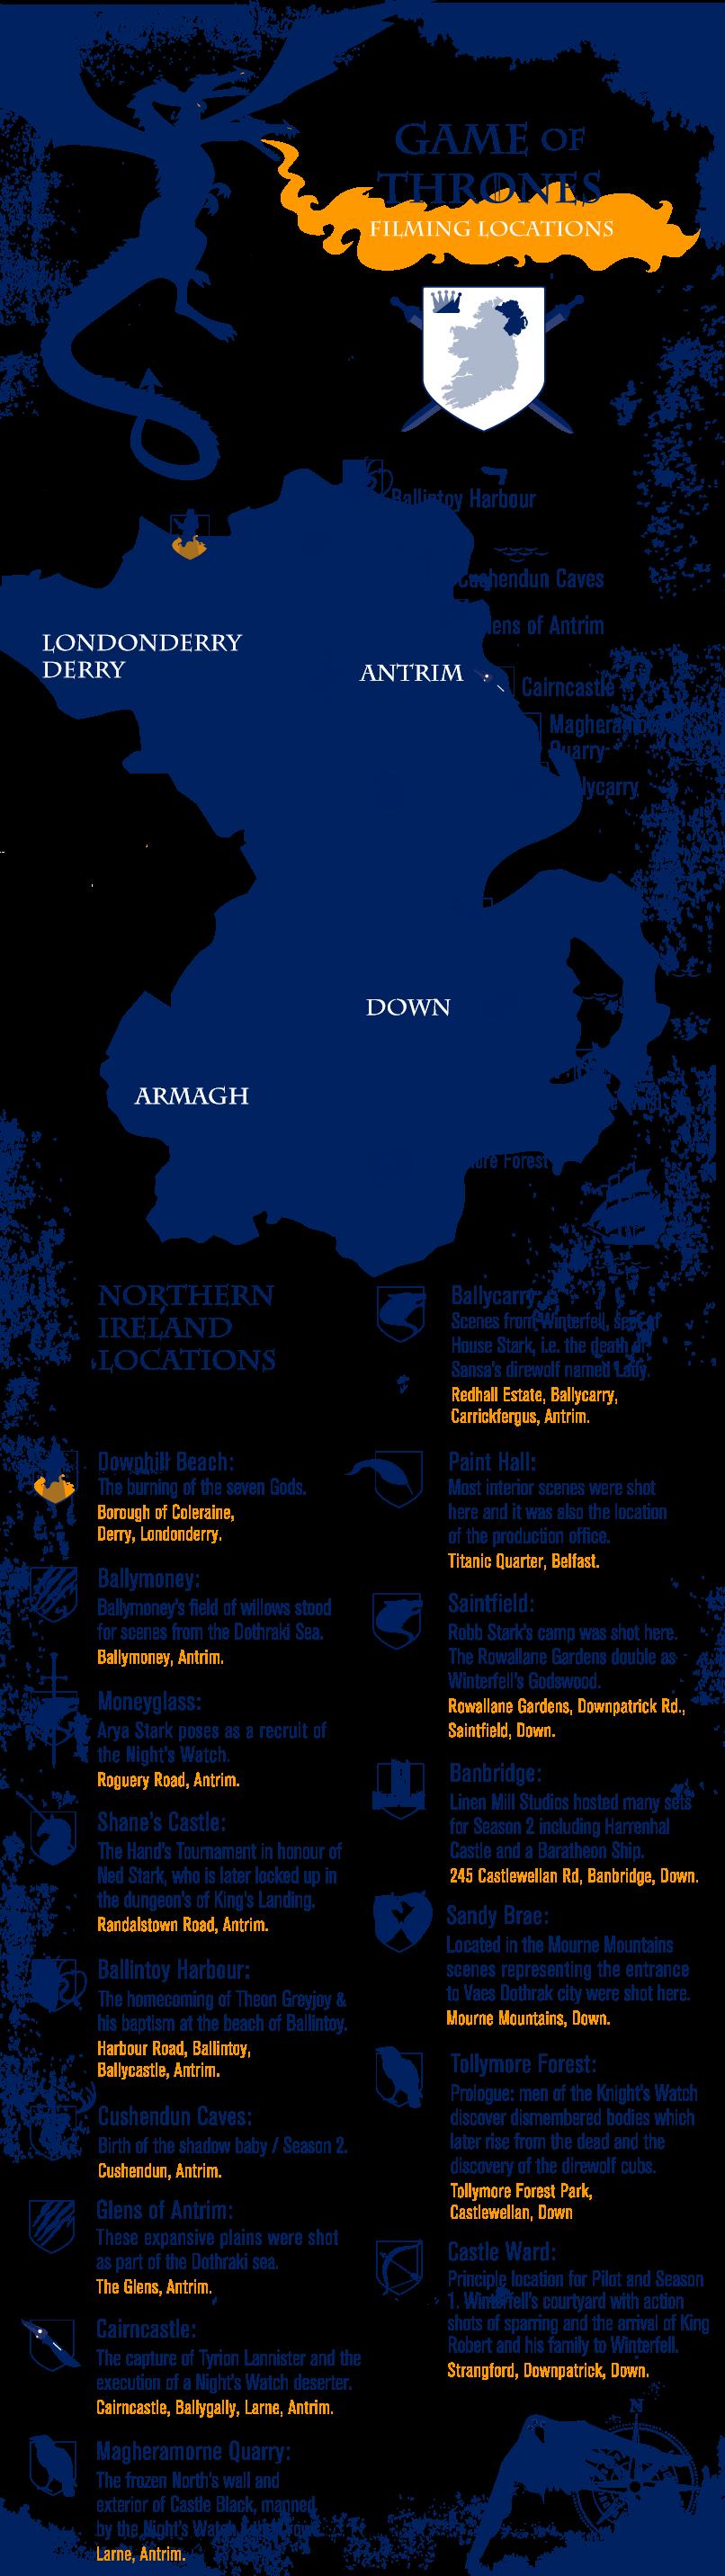 budget_car_rental_game_of_thrones_roadmap_pinterest